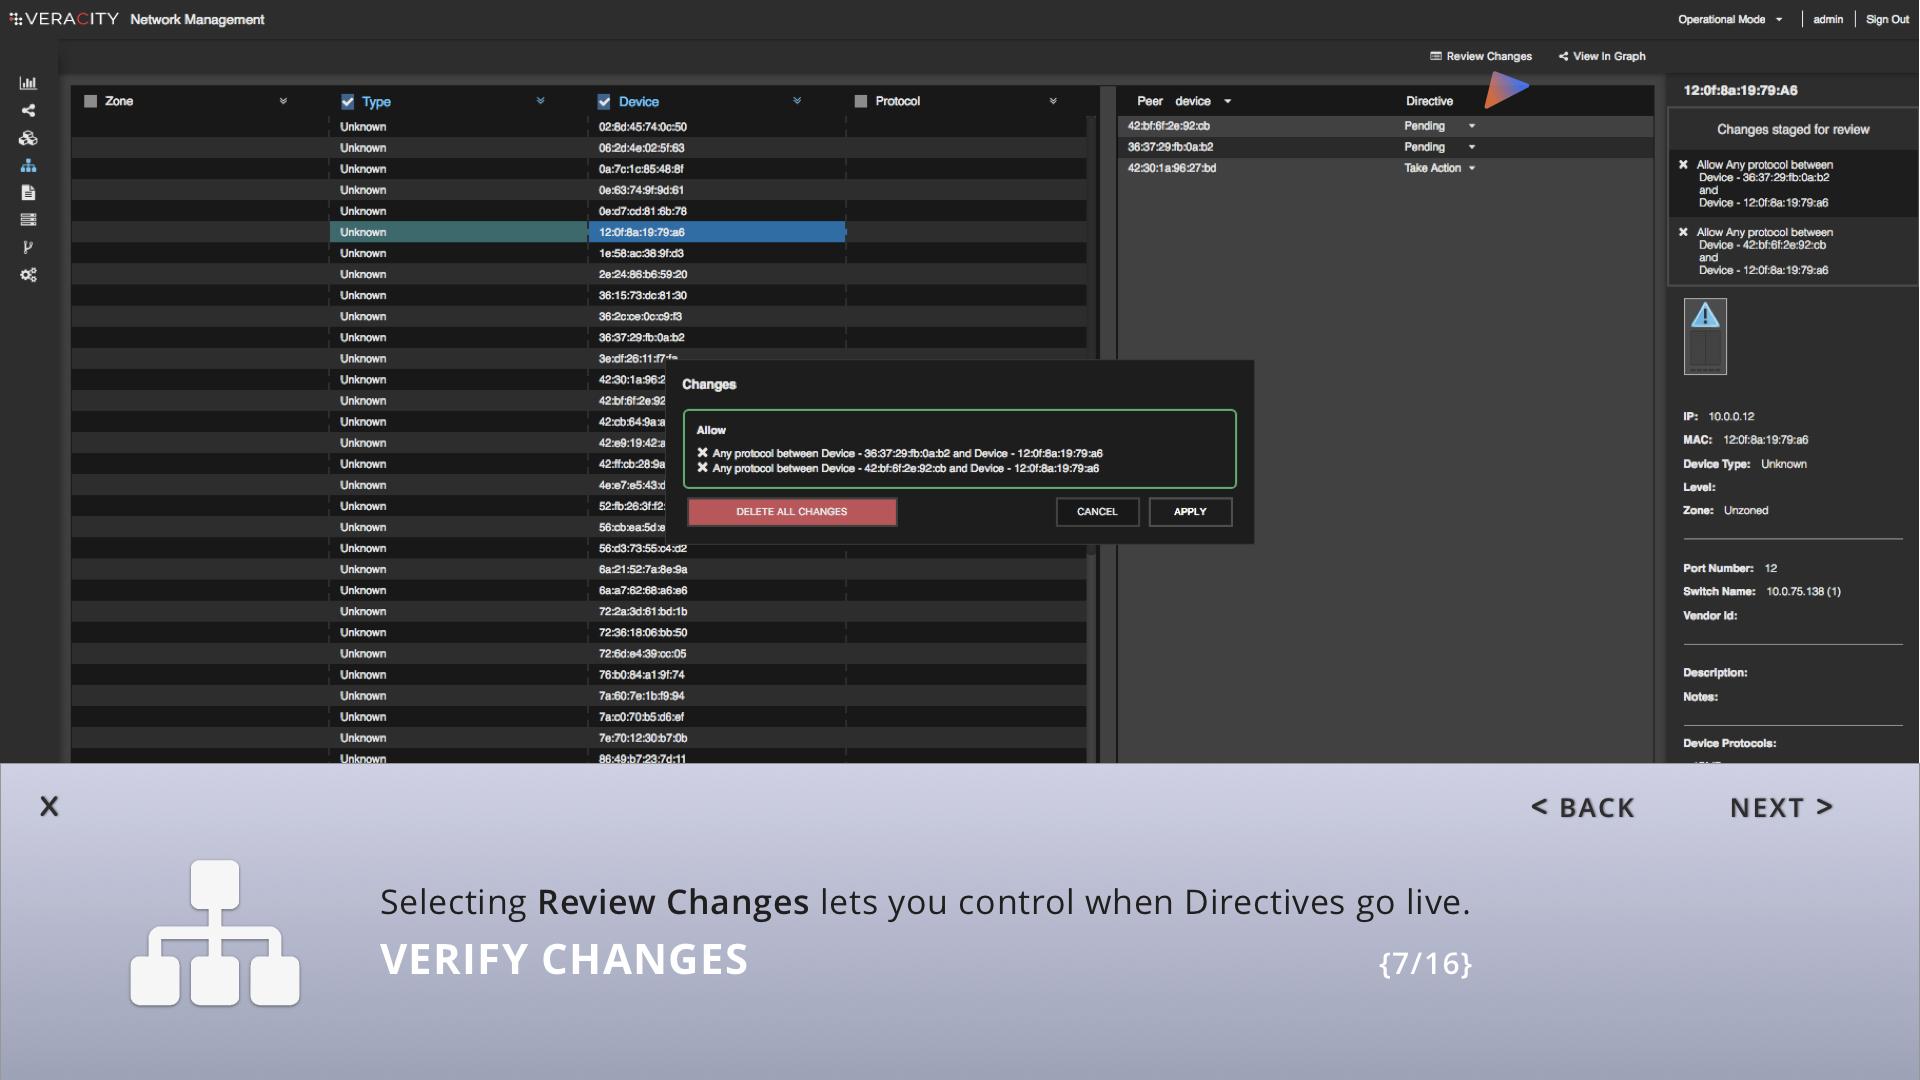 008B_Verify_Changes_Final.png